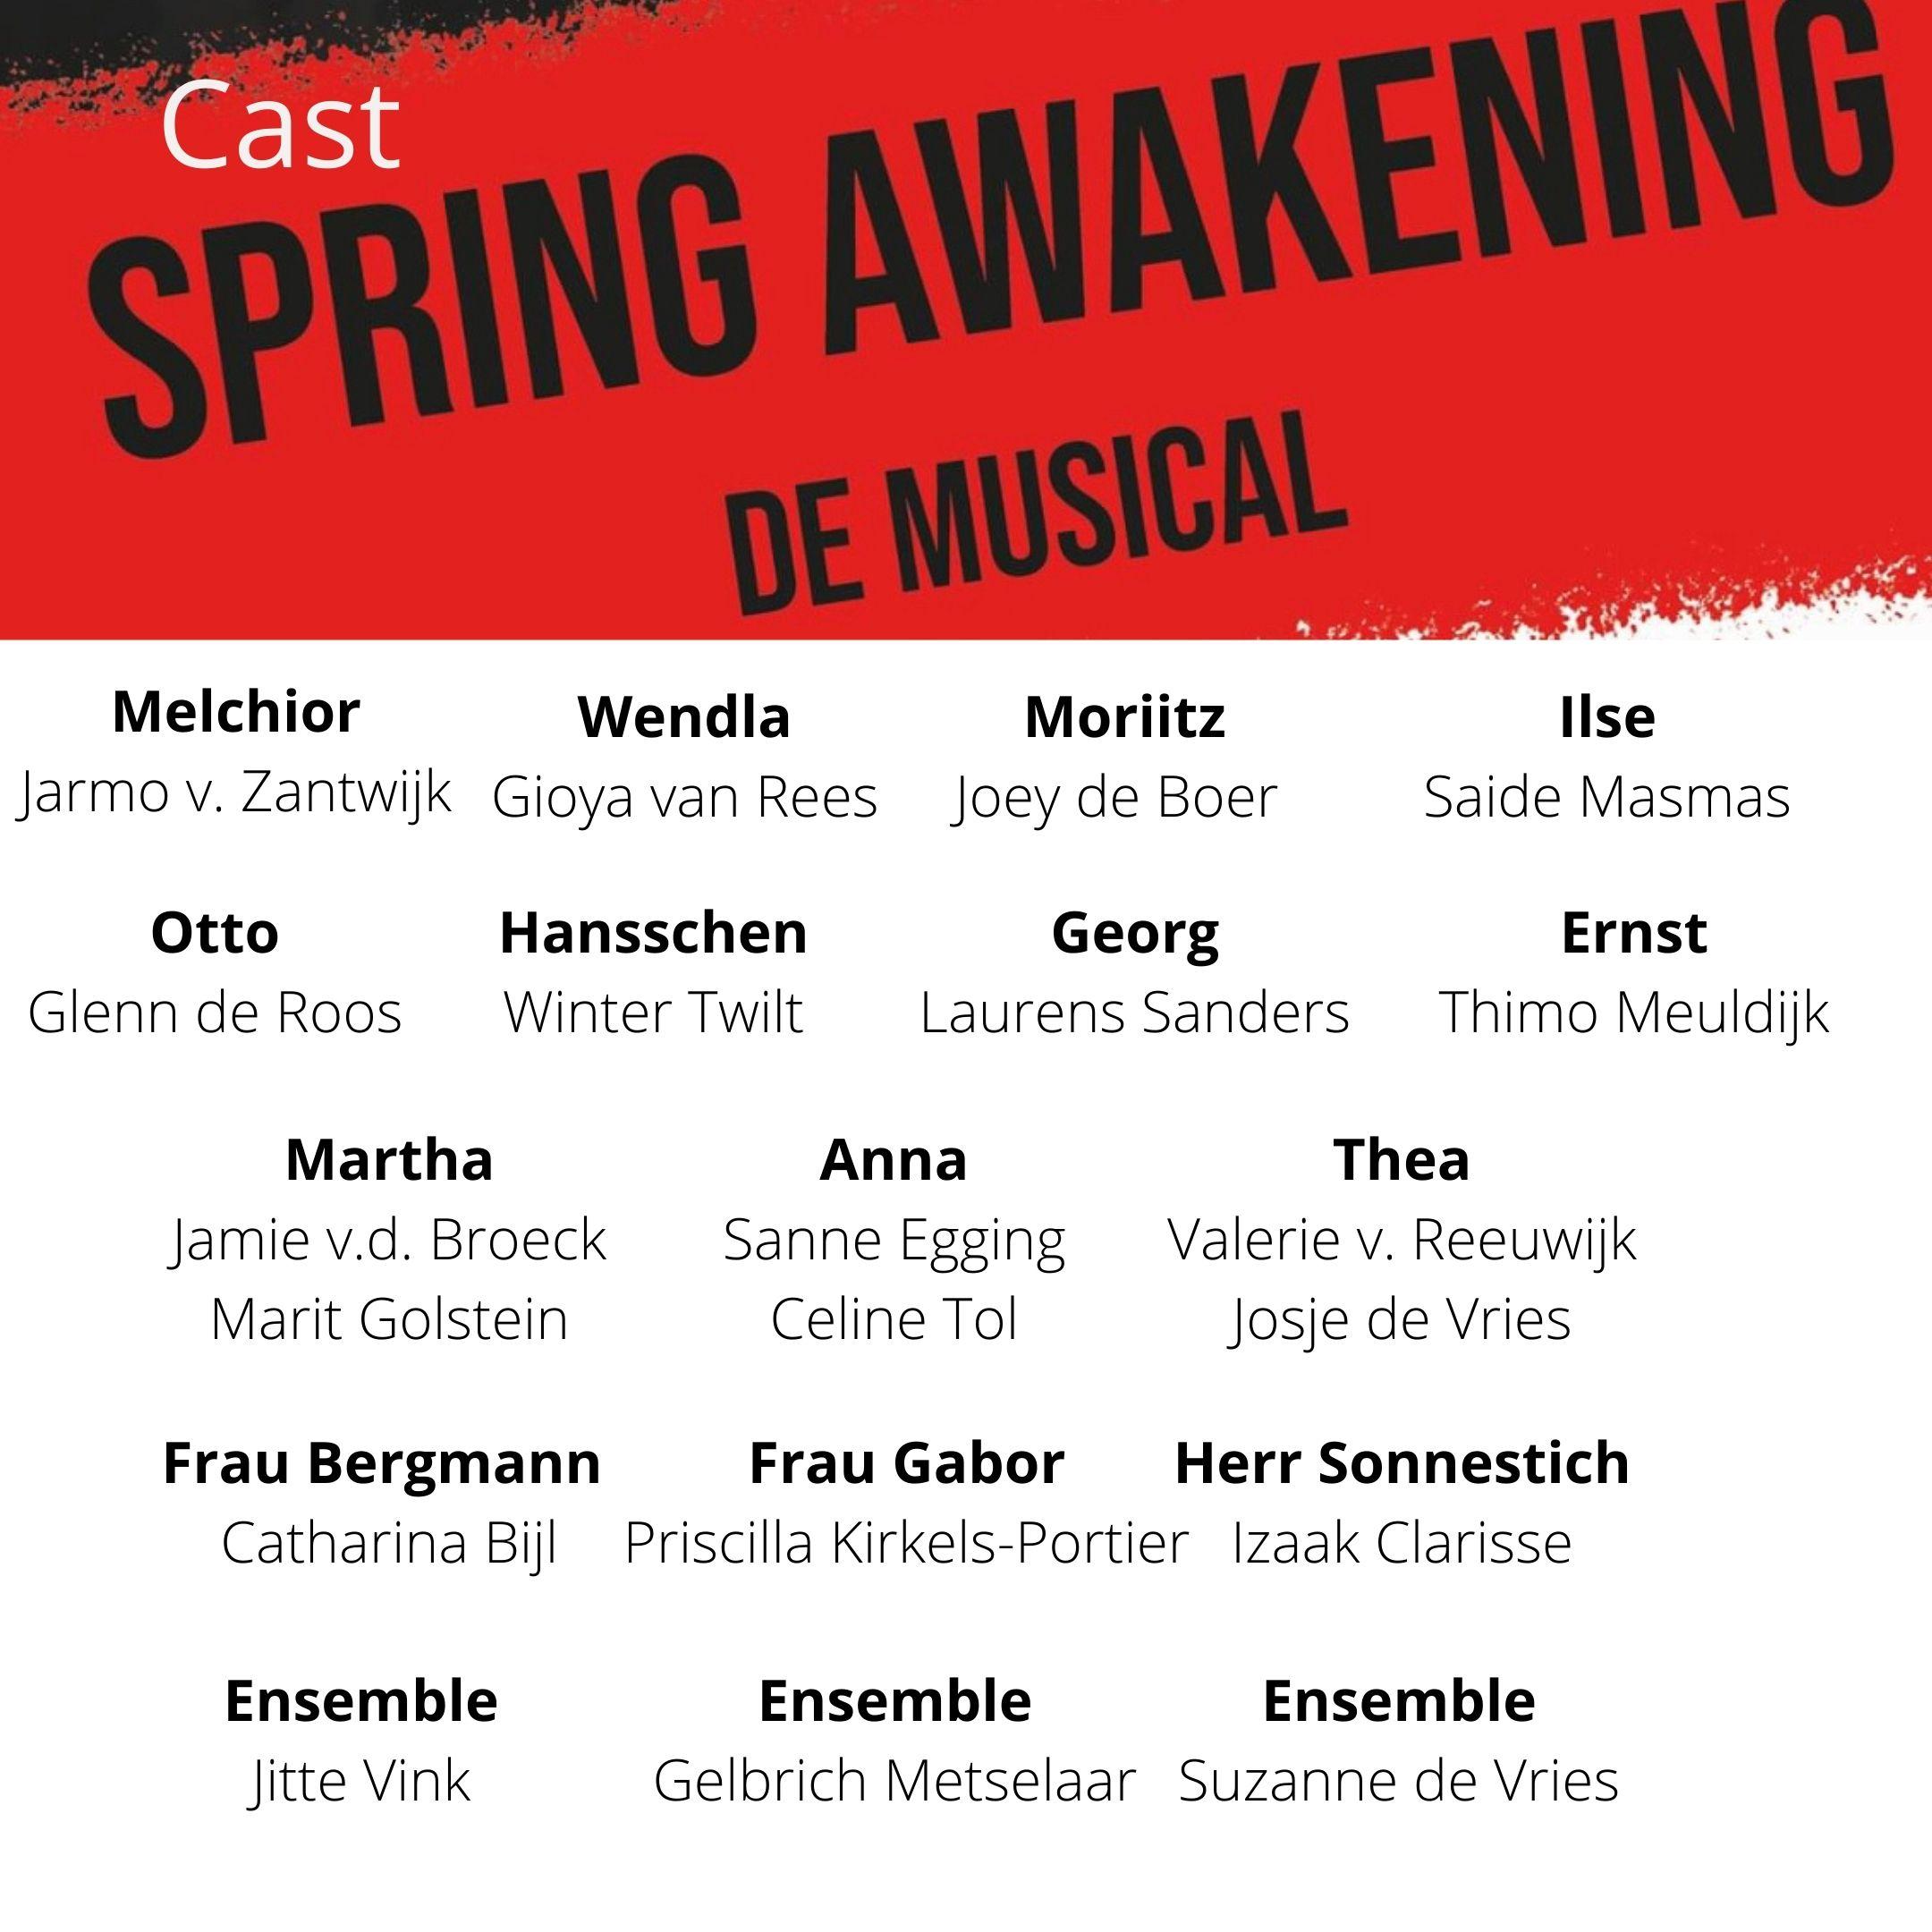 Cast Sping Awakening.def